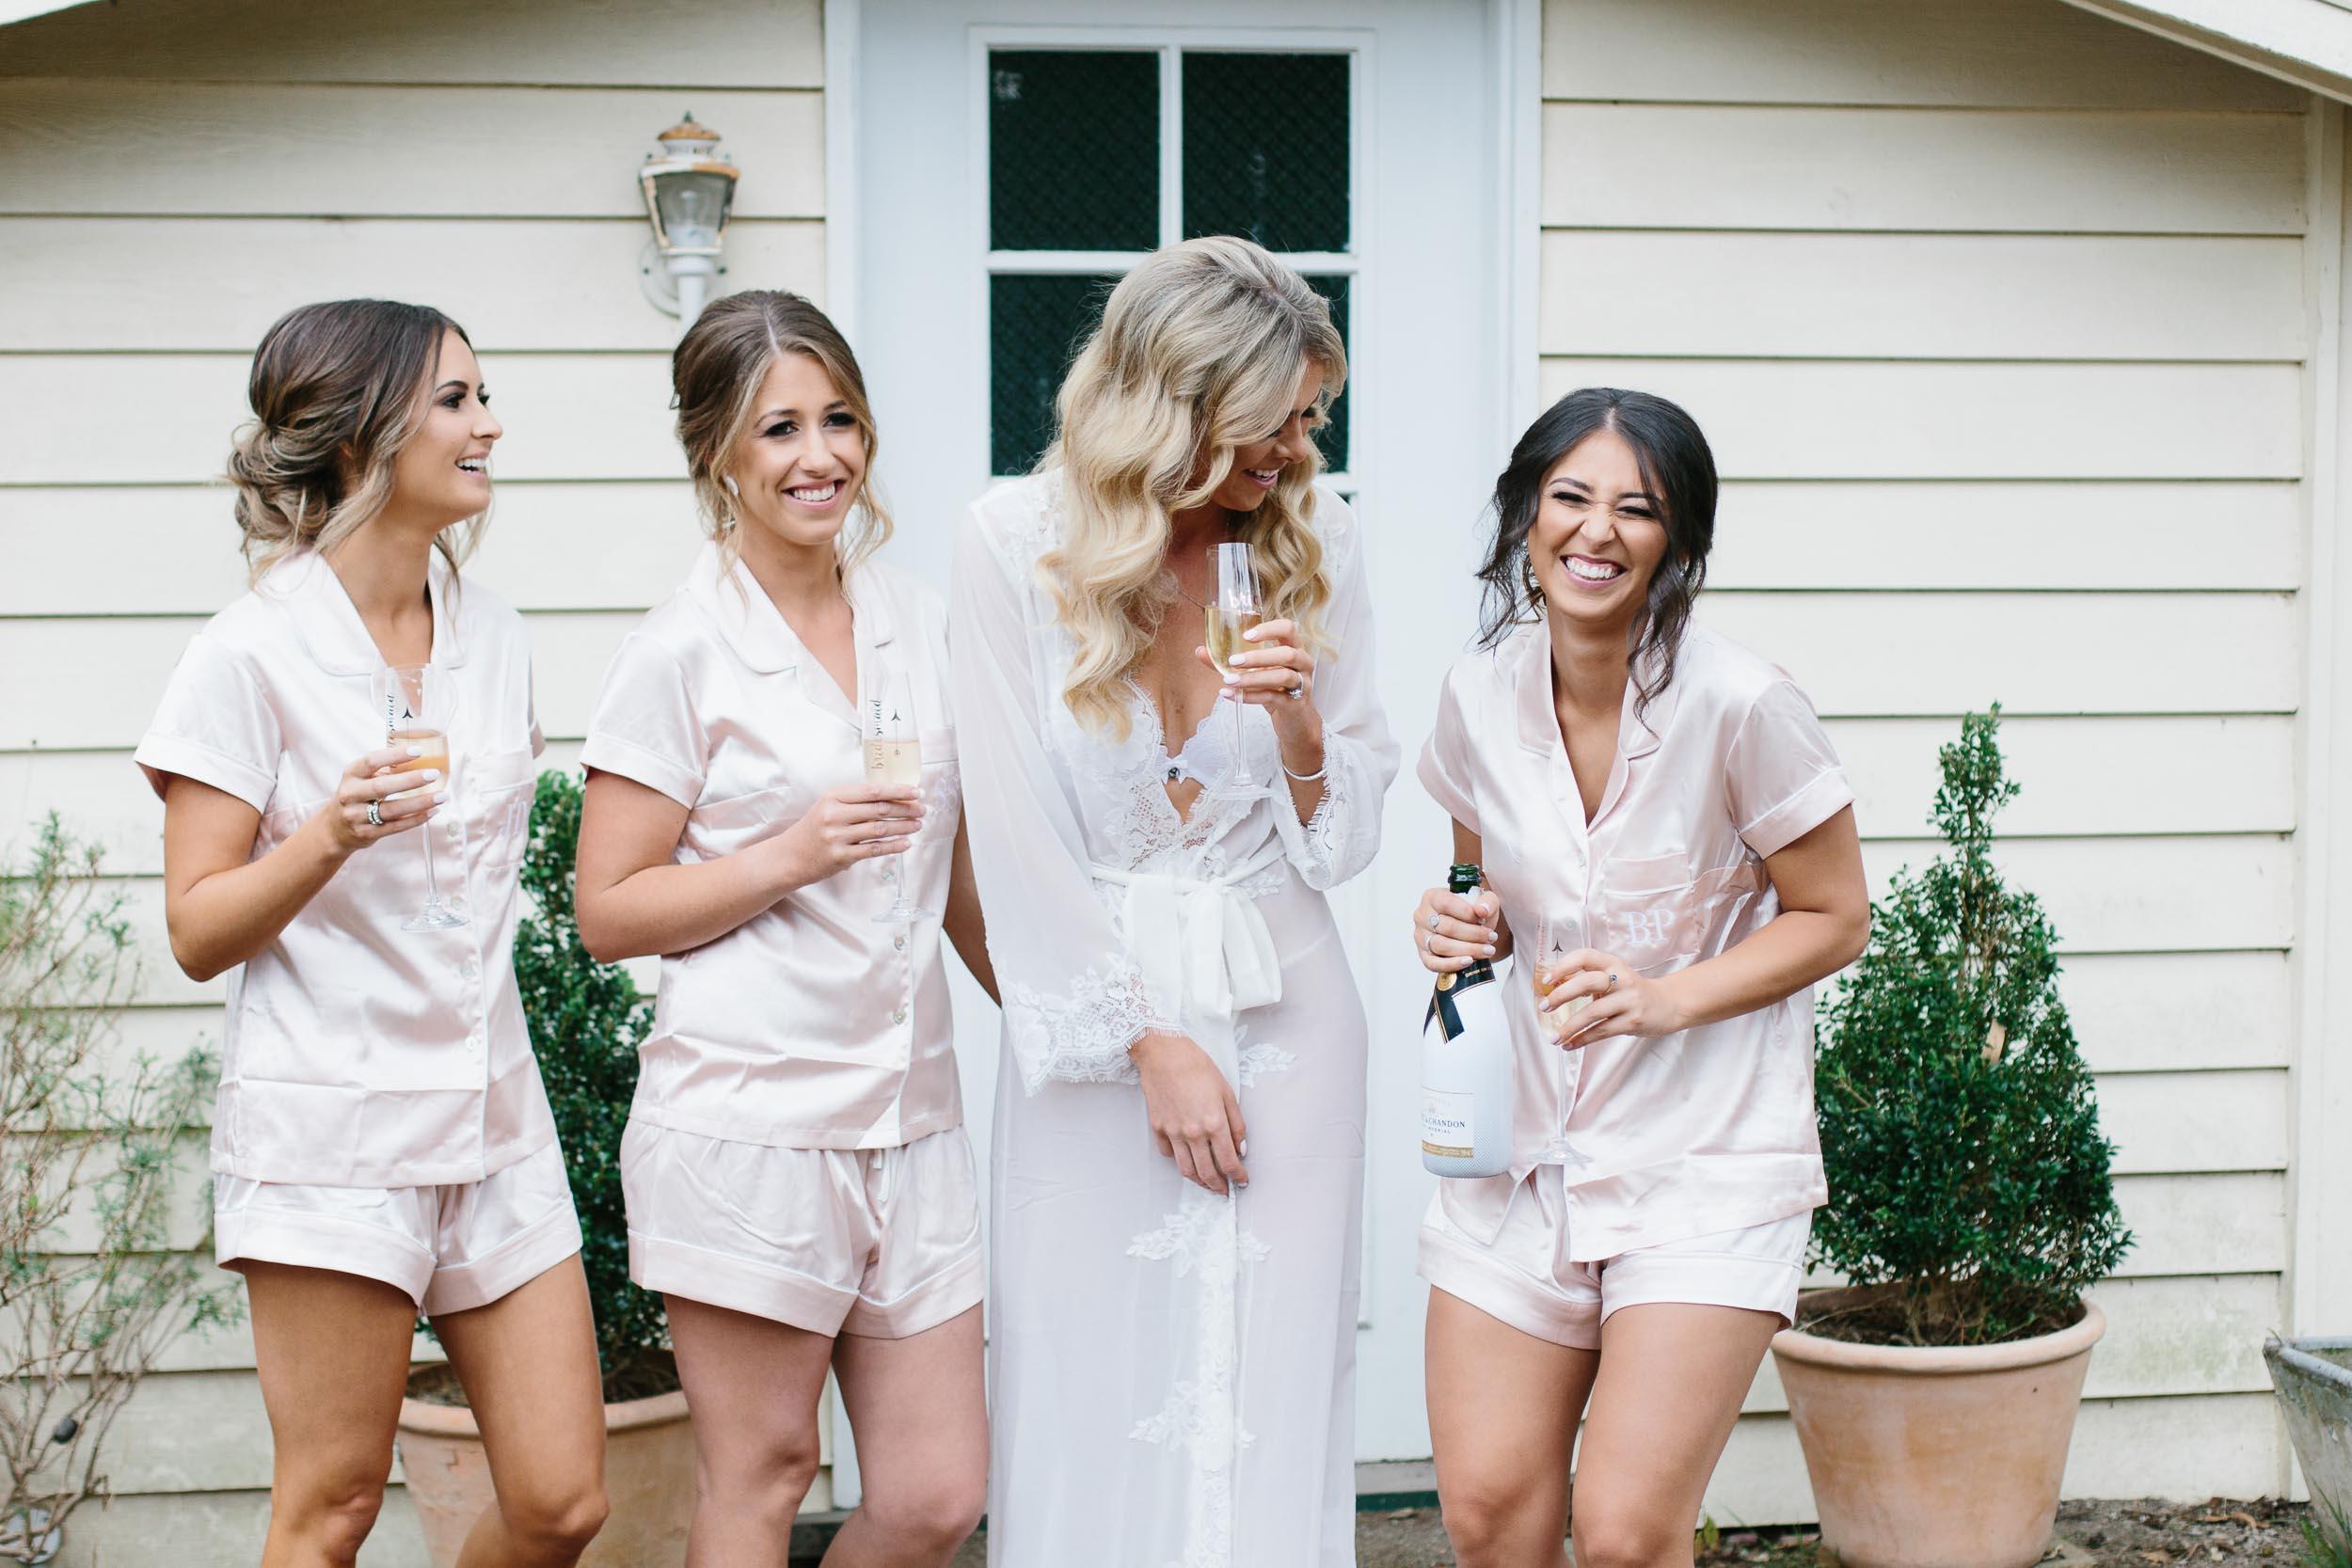 Kas-Richards-Mornington-Peninsula-Private-Property-Wedding-Marianna-Hardwick-Gown-65.jpg